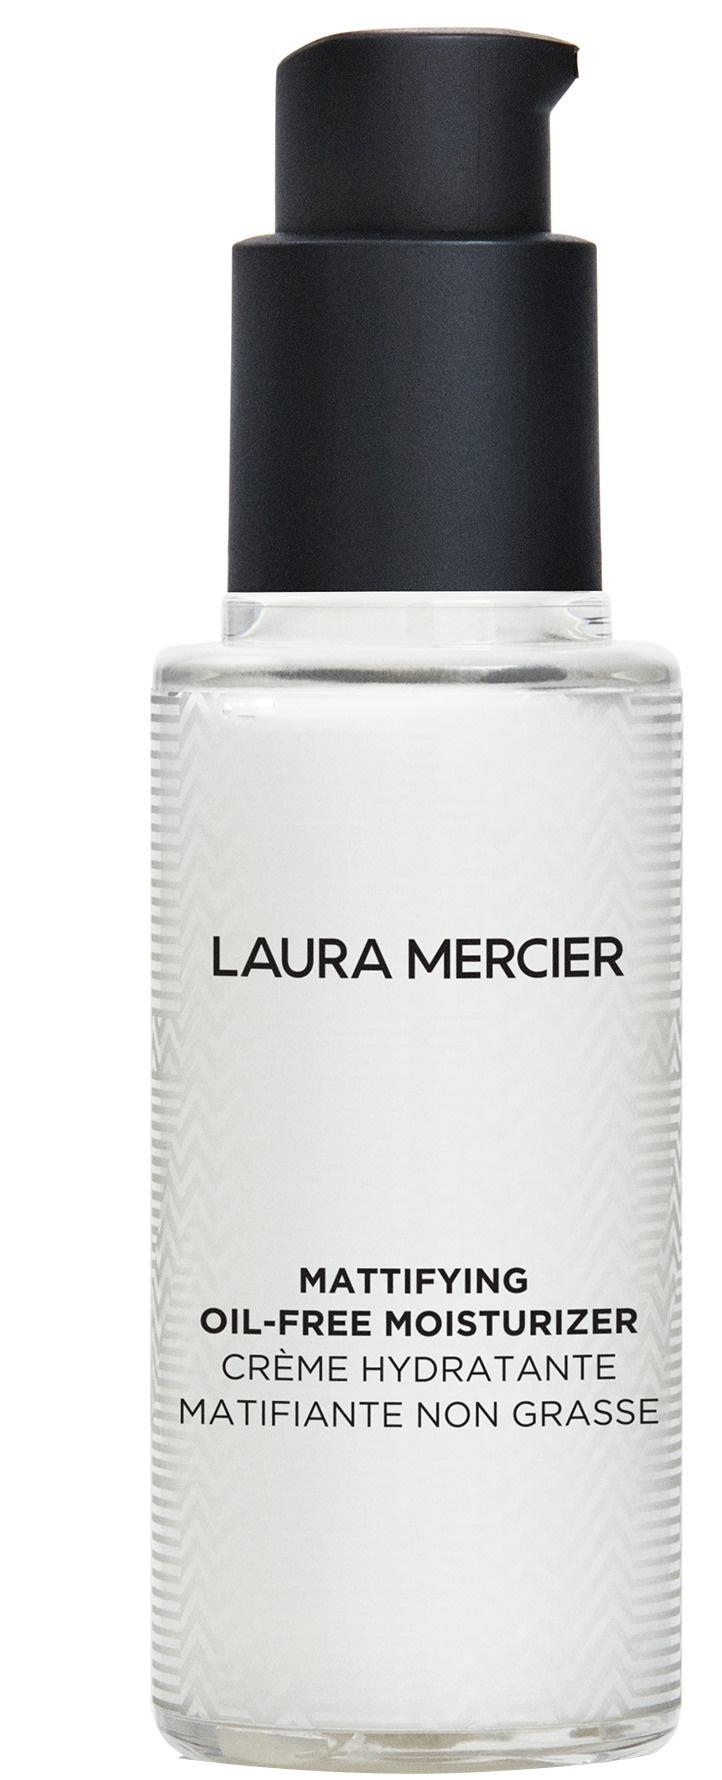 Laura Mercier Mattifying Moisturizer